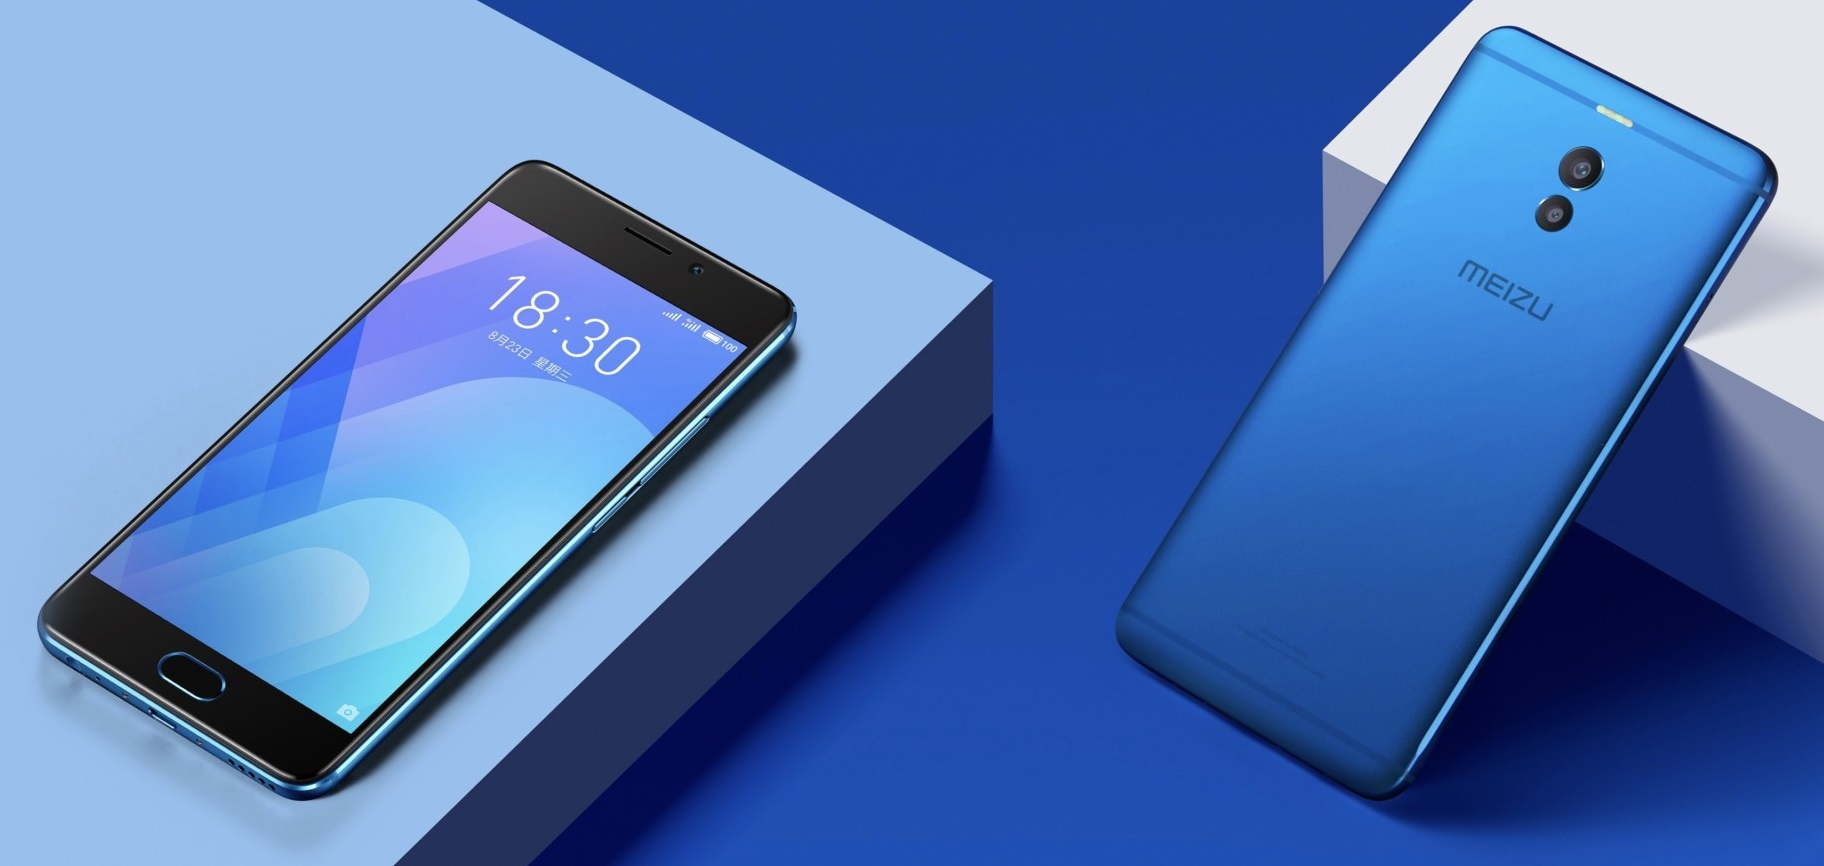 Топ-5 смартфонов на Android из Поднебесной - Смартфон Meizu